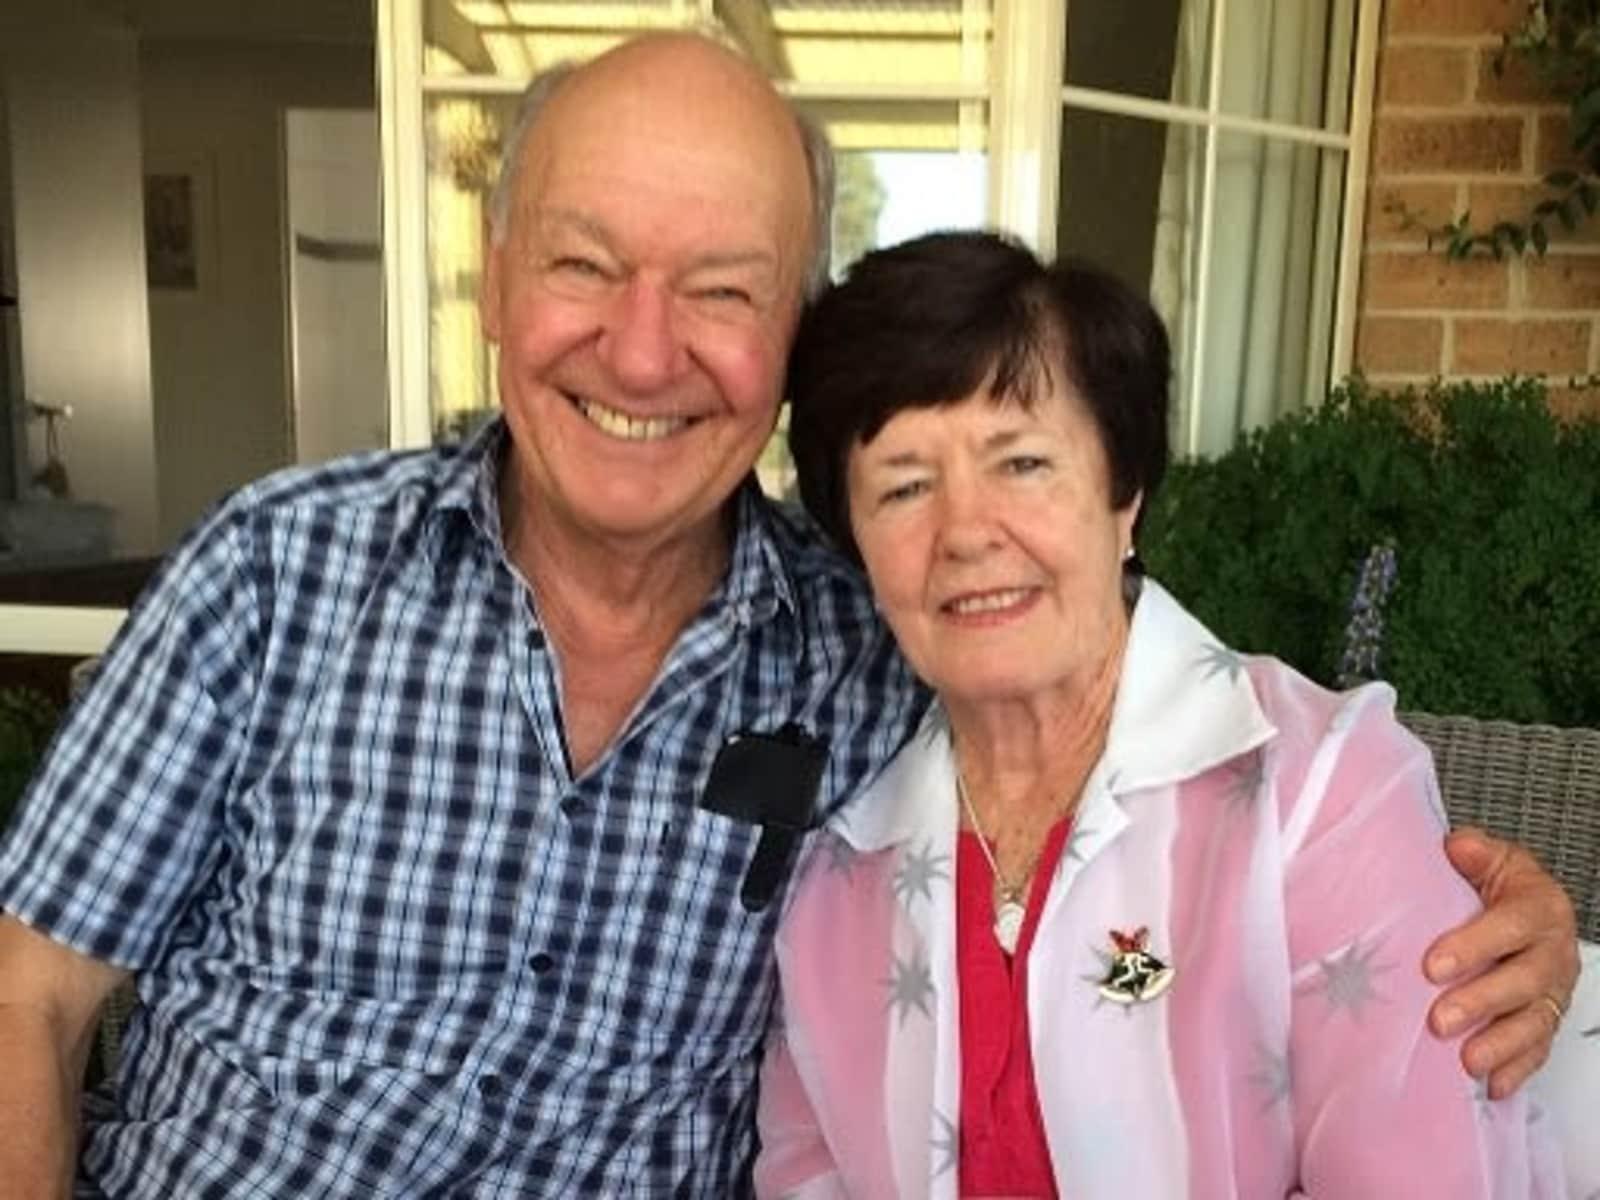 Brian & Denise from Melbourne, Victoria, Australia